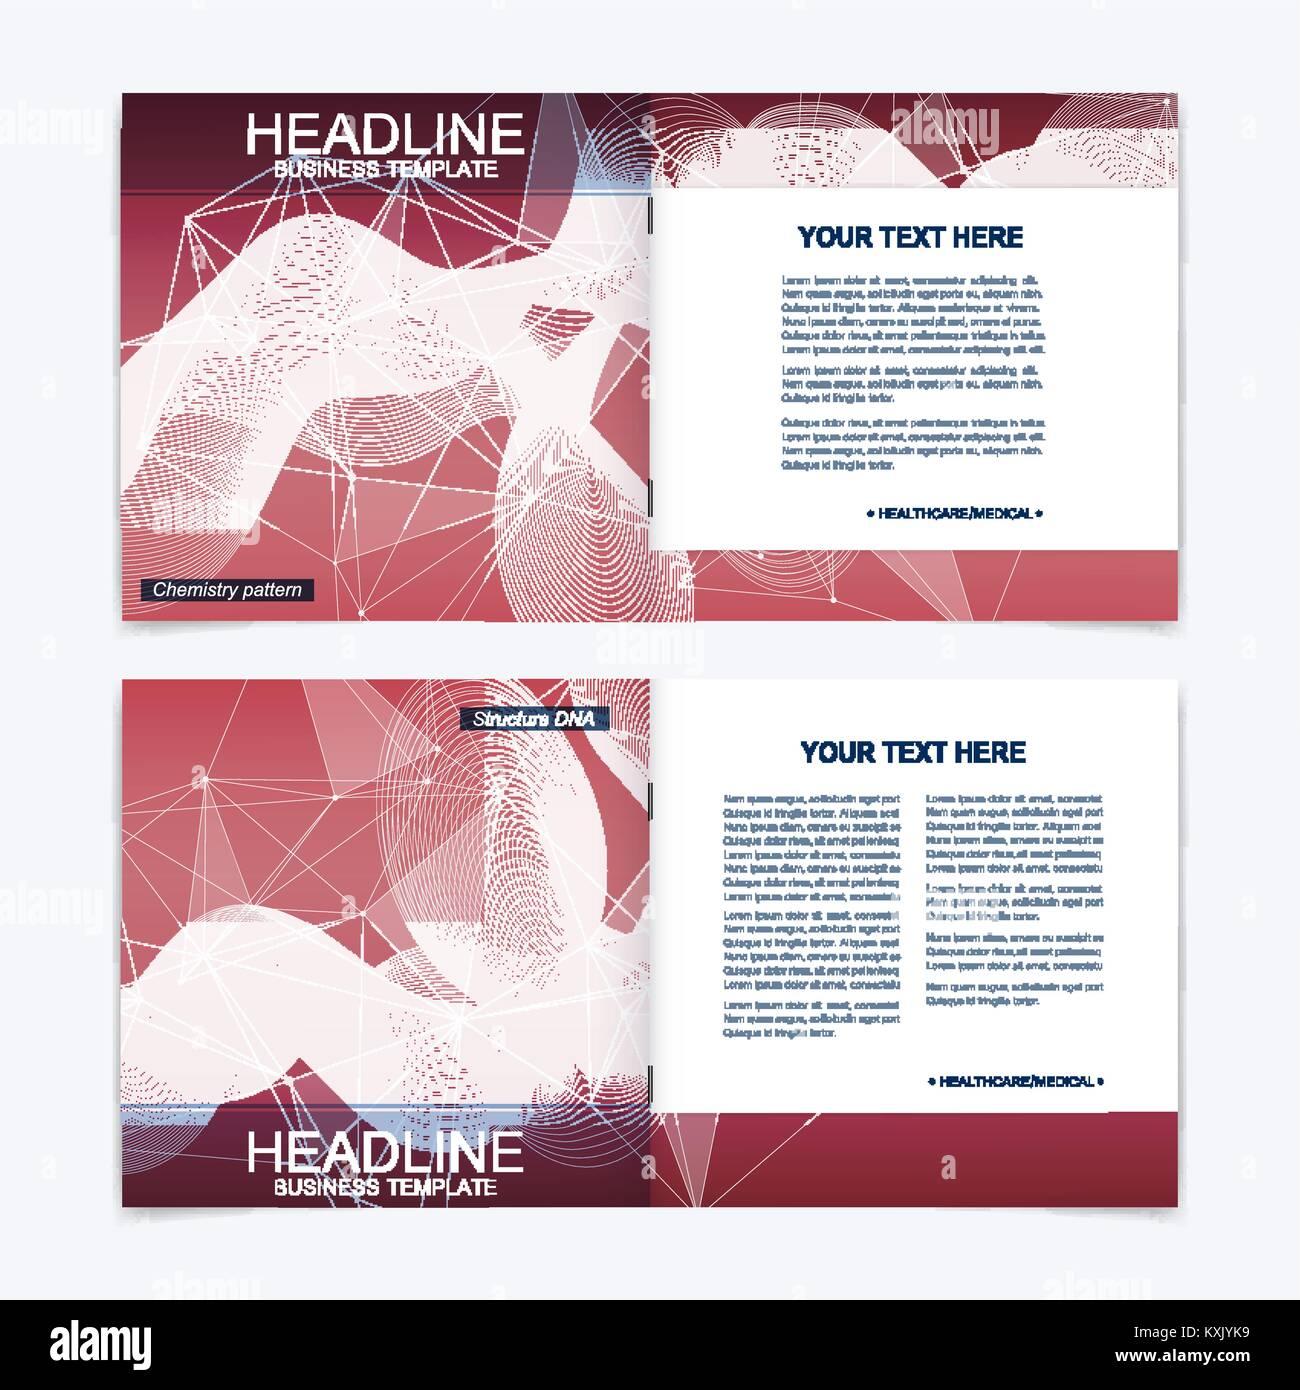 Nett Informative Broschürenvorlagen Fotos - Entry Level Resume ...